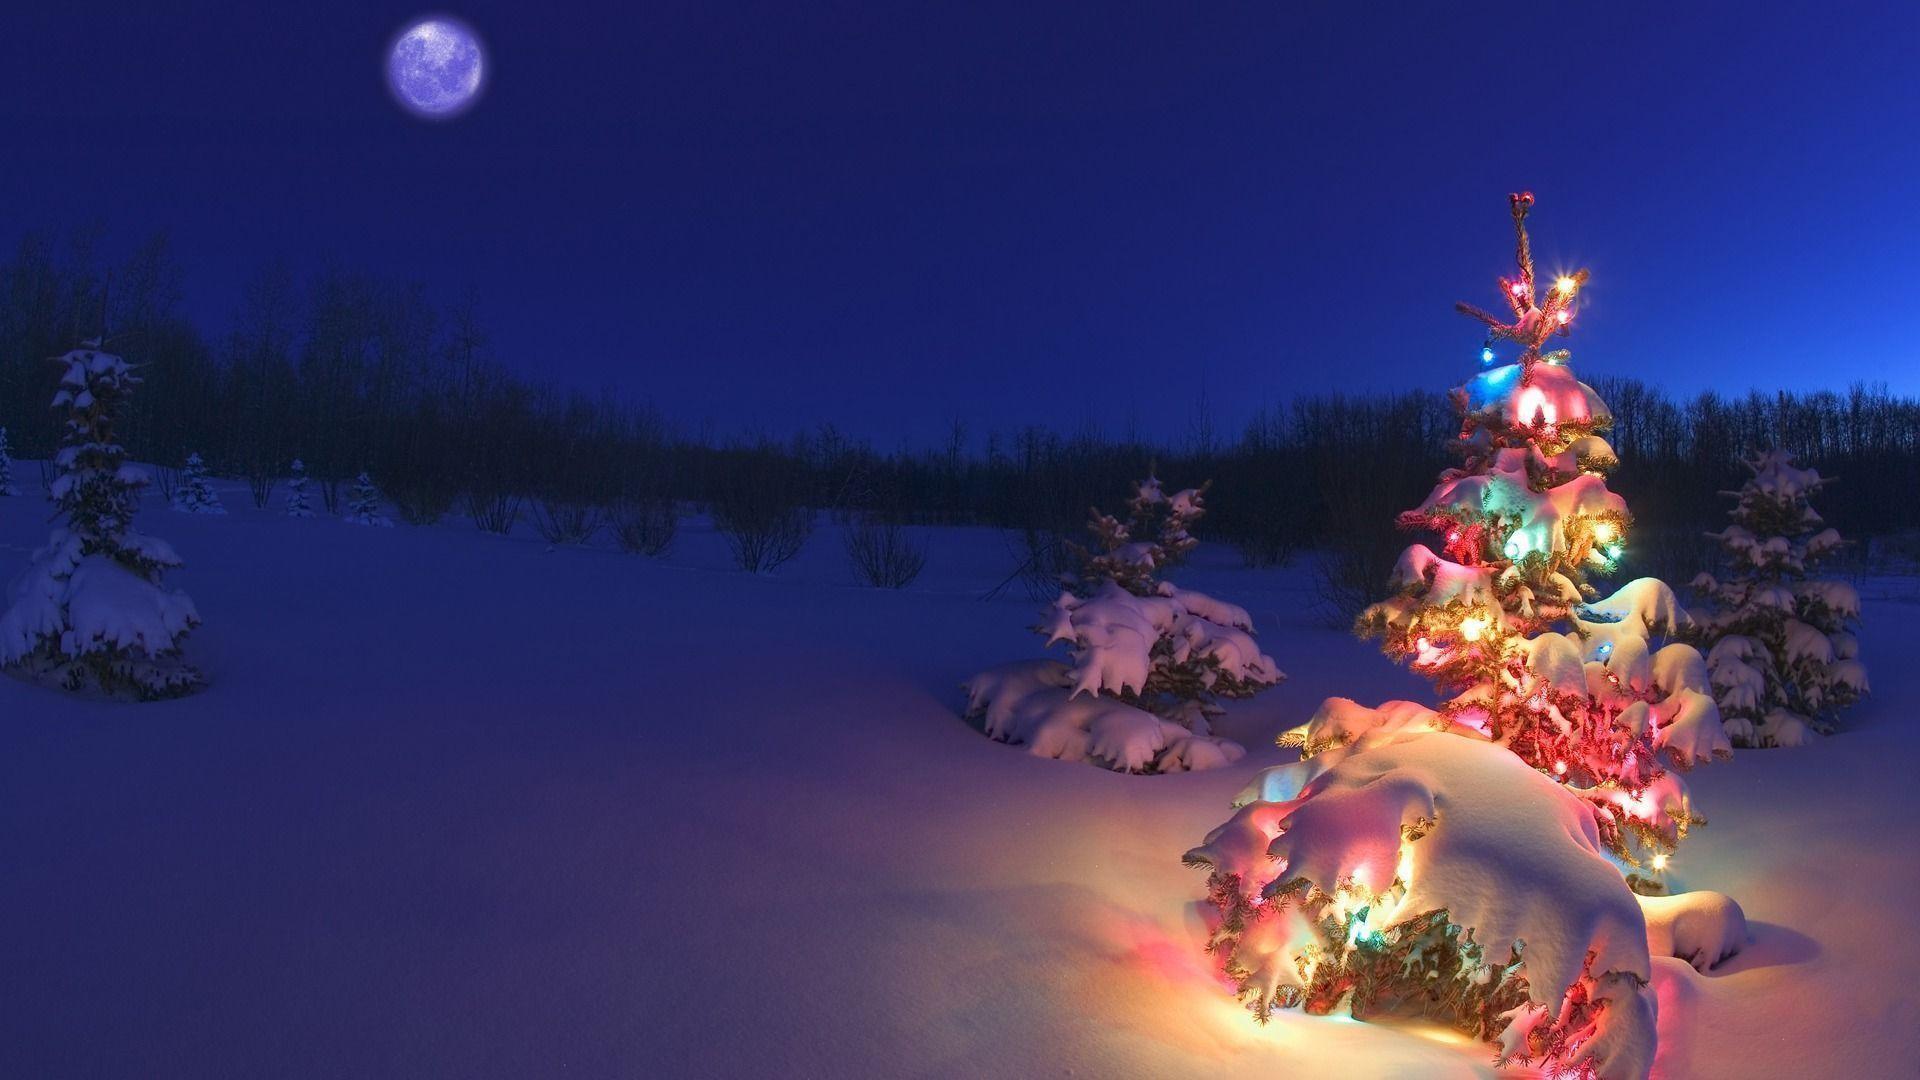 Res: 1920x1080, Nice Chrstmas Wallpaper. Â« Christmas WallpaperChristmas ...